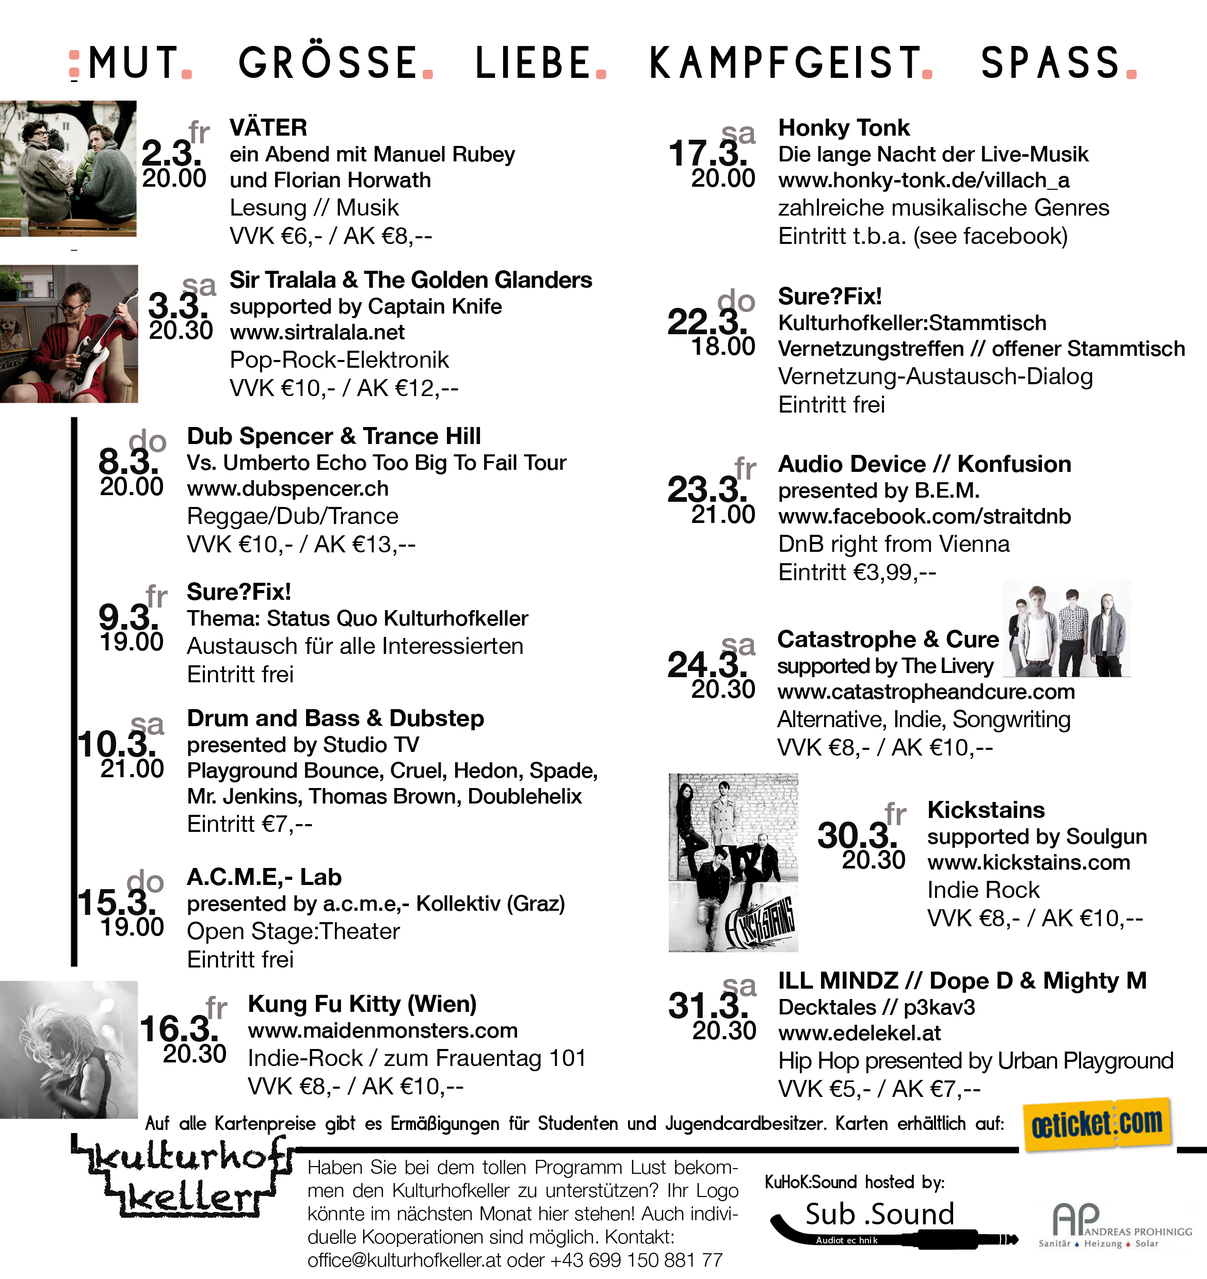 Kulturhof:keller (innen)